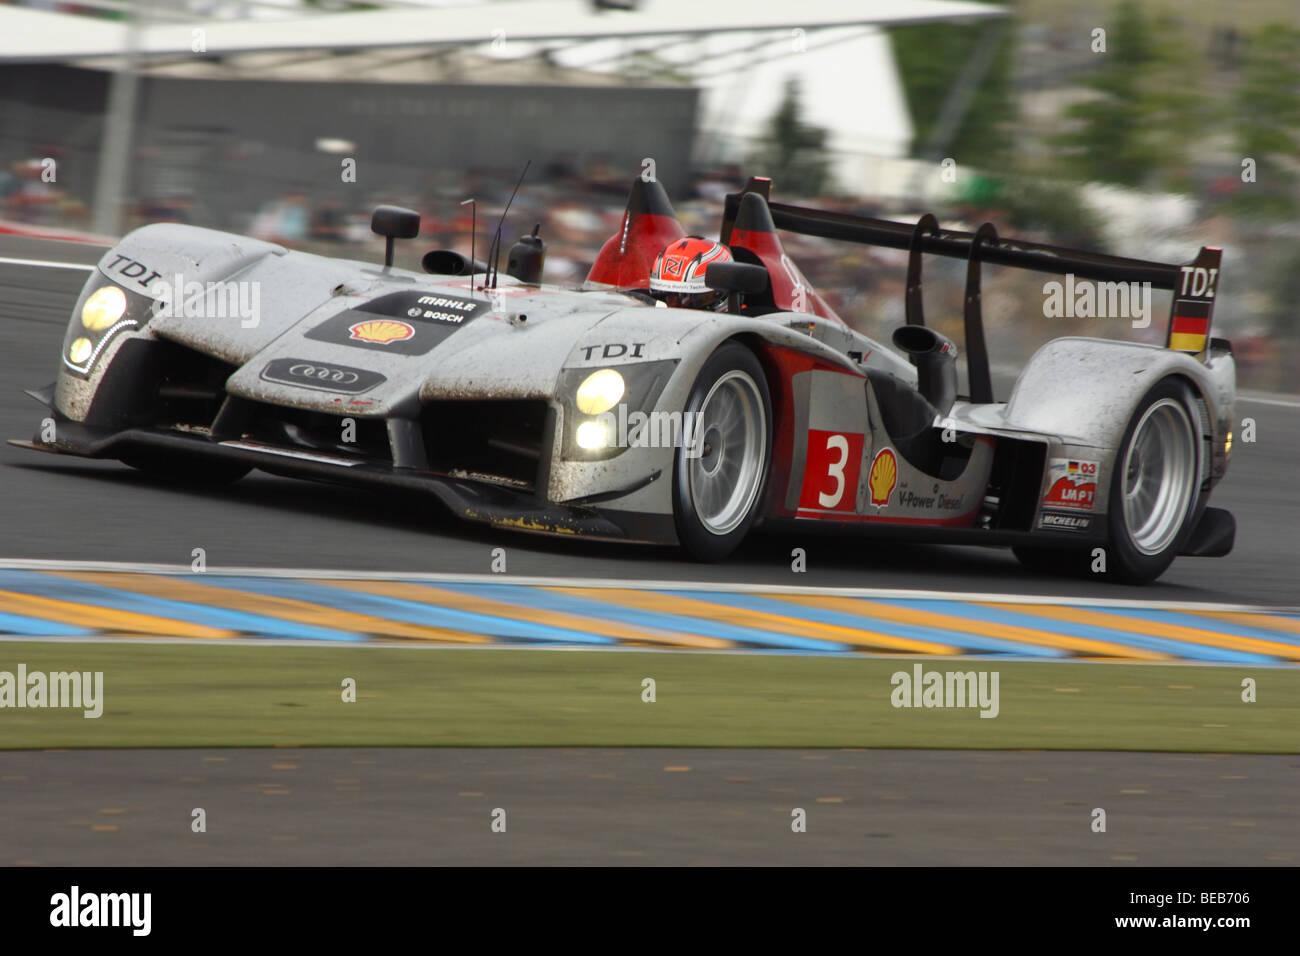 24 Stunden von Le Mans 2009 - Audi R15 TDI N ° 3 Stockbild